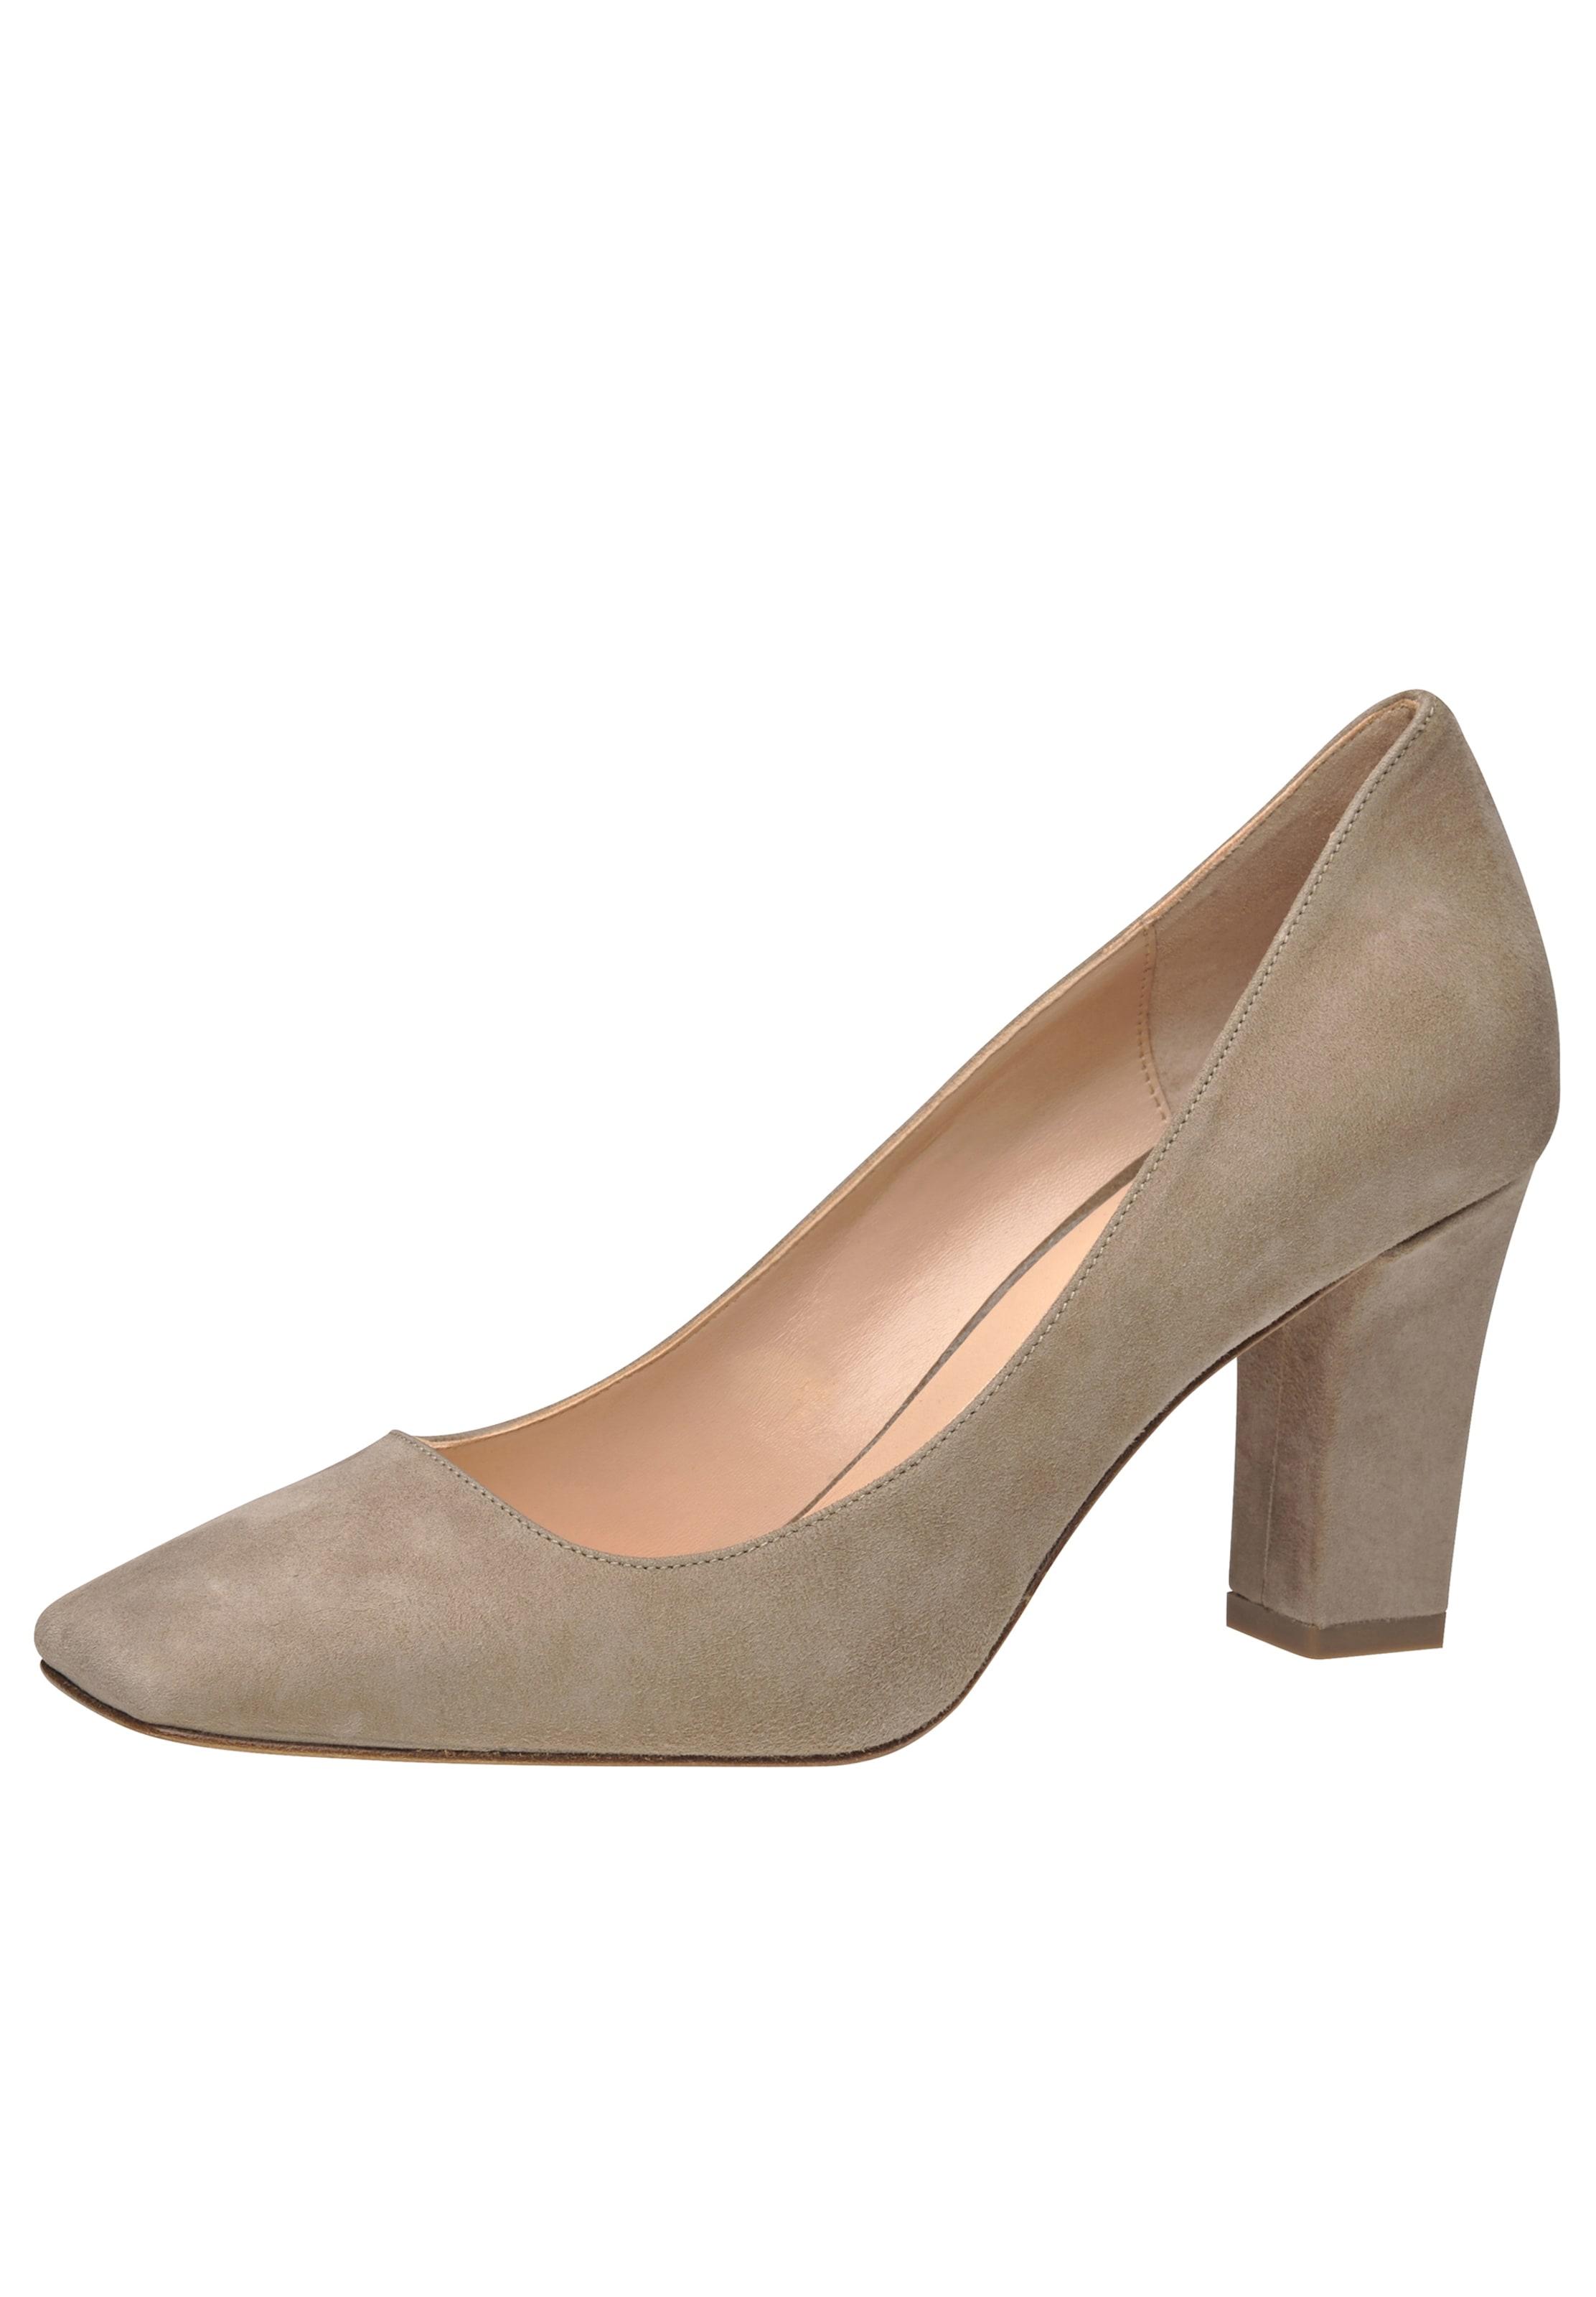 Haltbare Mode billige Pumps Schuhe EVITA | Damen Pumps billige Schuhe Gut getragene Schuhe 89a63d